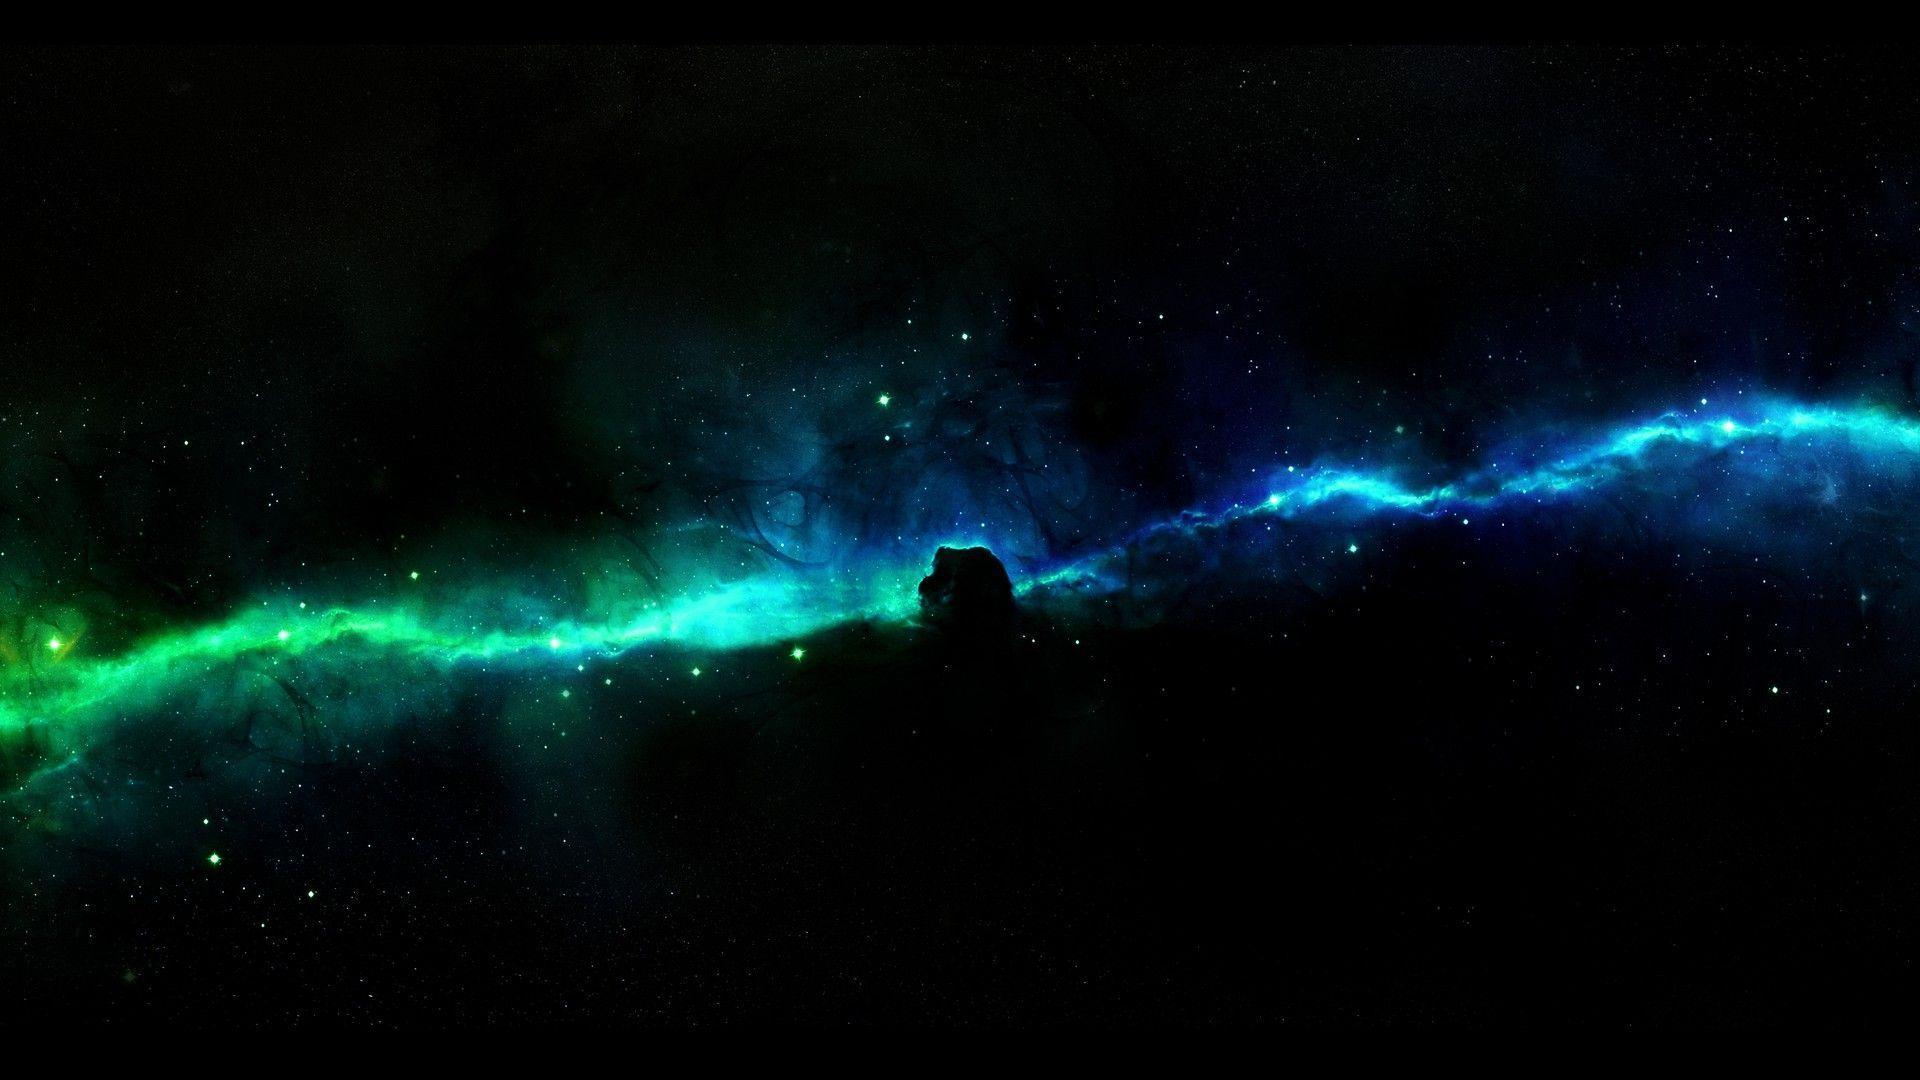 nebula wallpaper collection for your ipad 1920×1080 nebula wallpaper